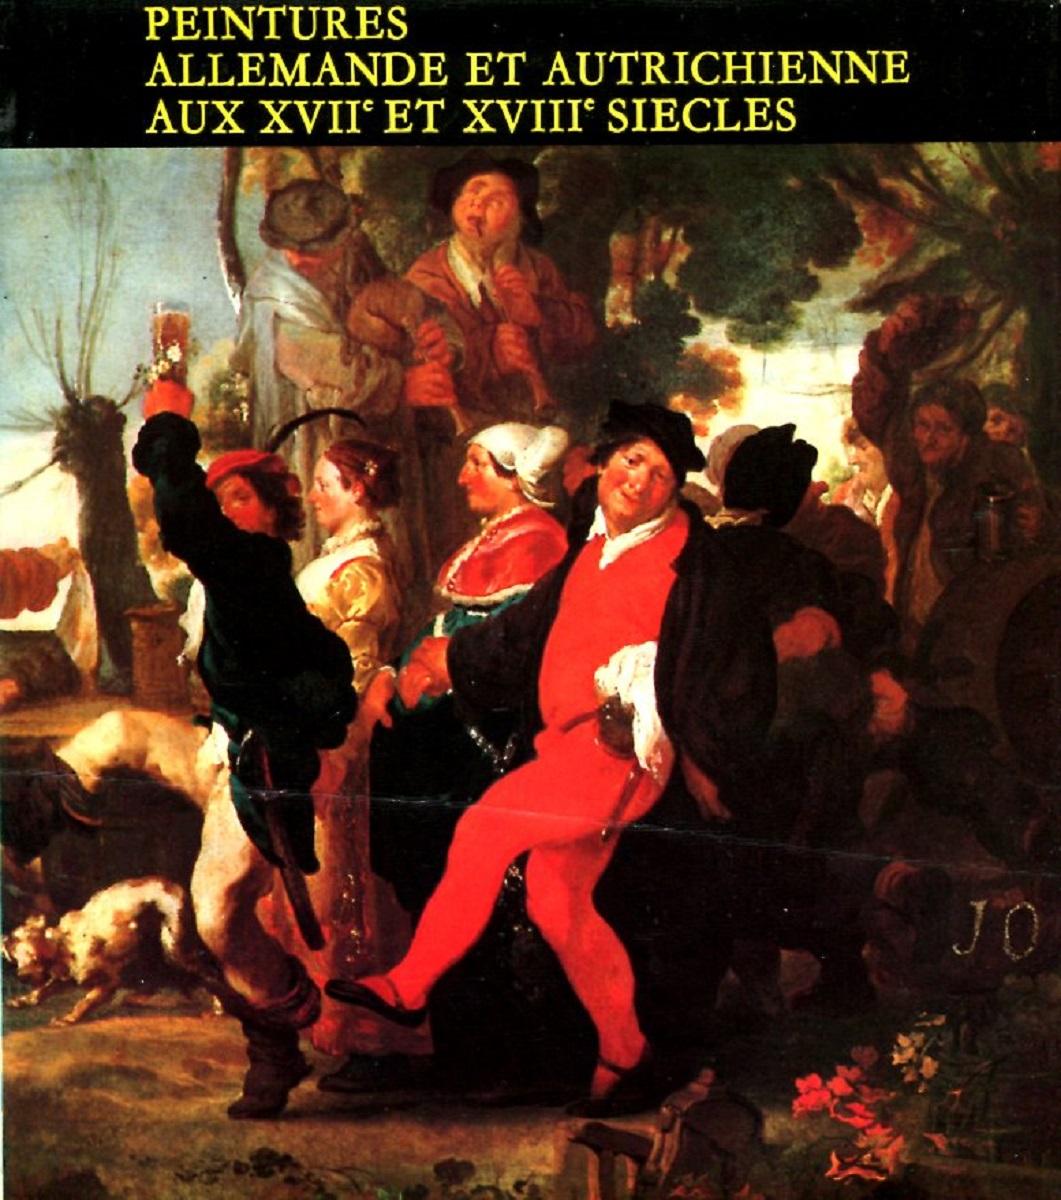 Peintures Allemande et Autrichienne aux XVII et XVIII siecles ансамбль gnessin baroque итальянская музыка xvii xviii вв 2019 05 11t19 00